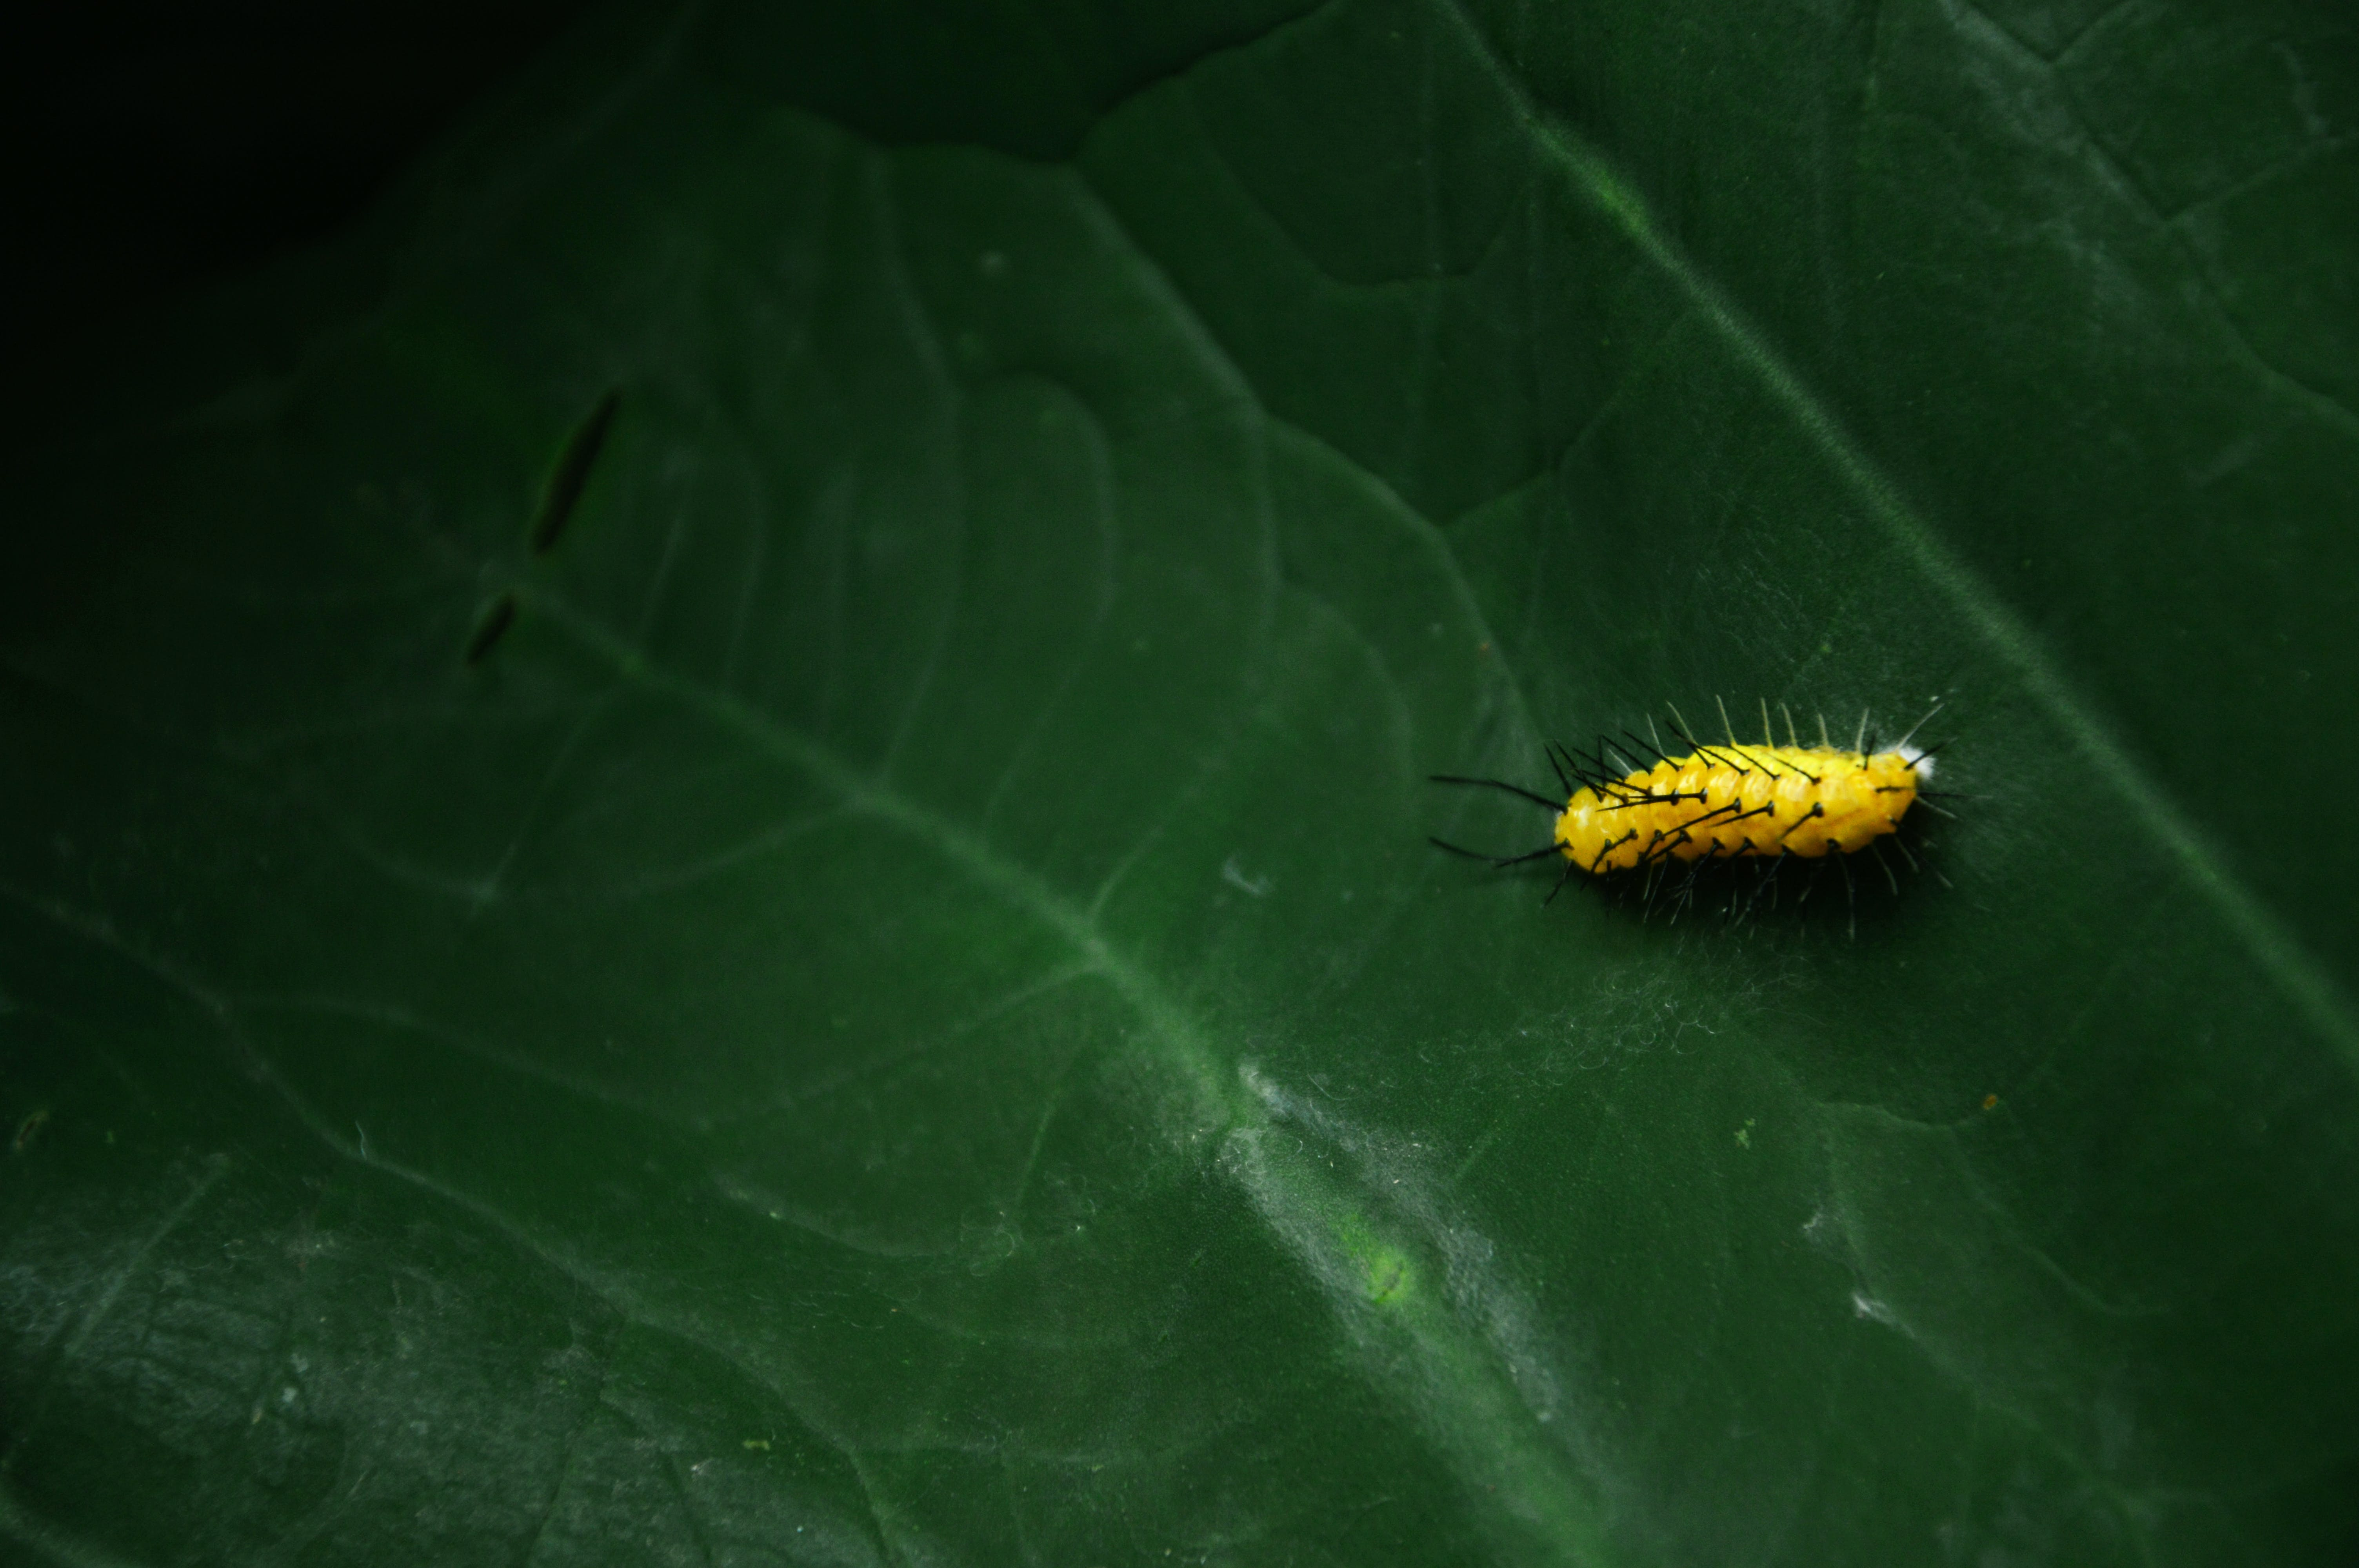 grøn, insekt, larve